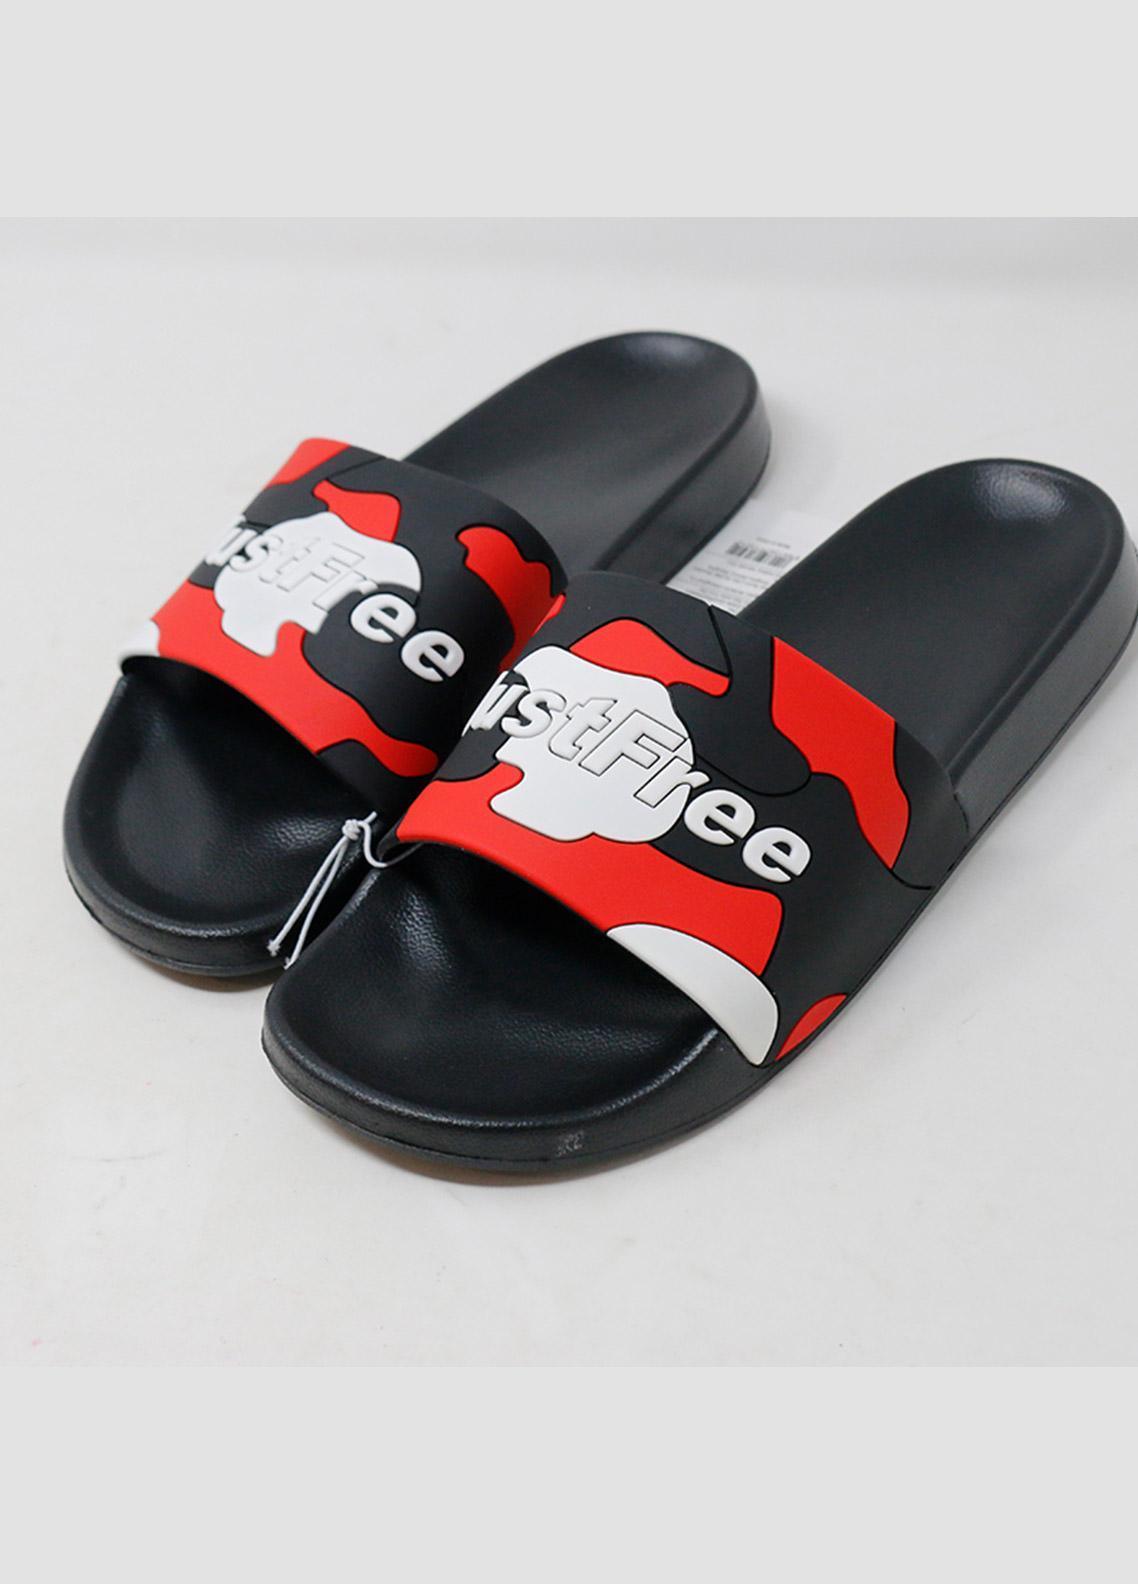 Mumuso Casual Style  Flat Slippers 42 Black